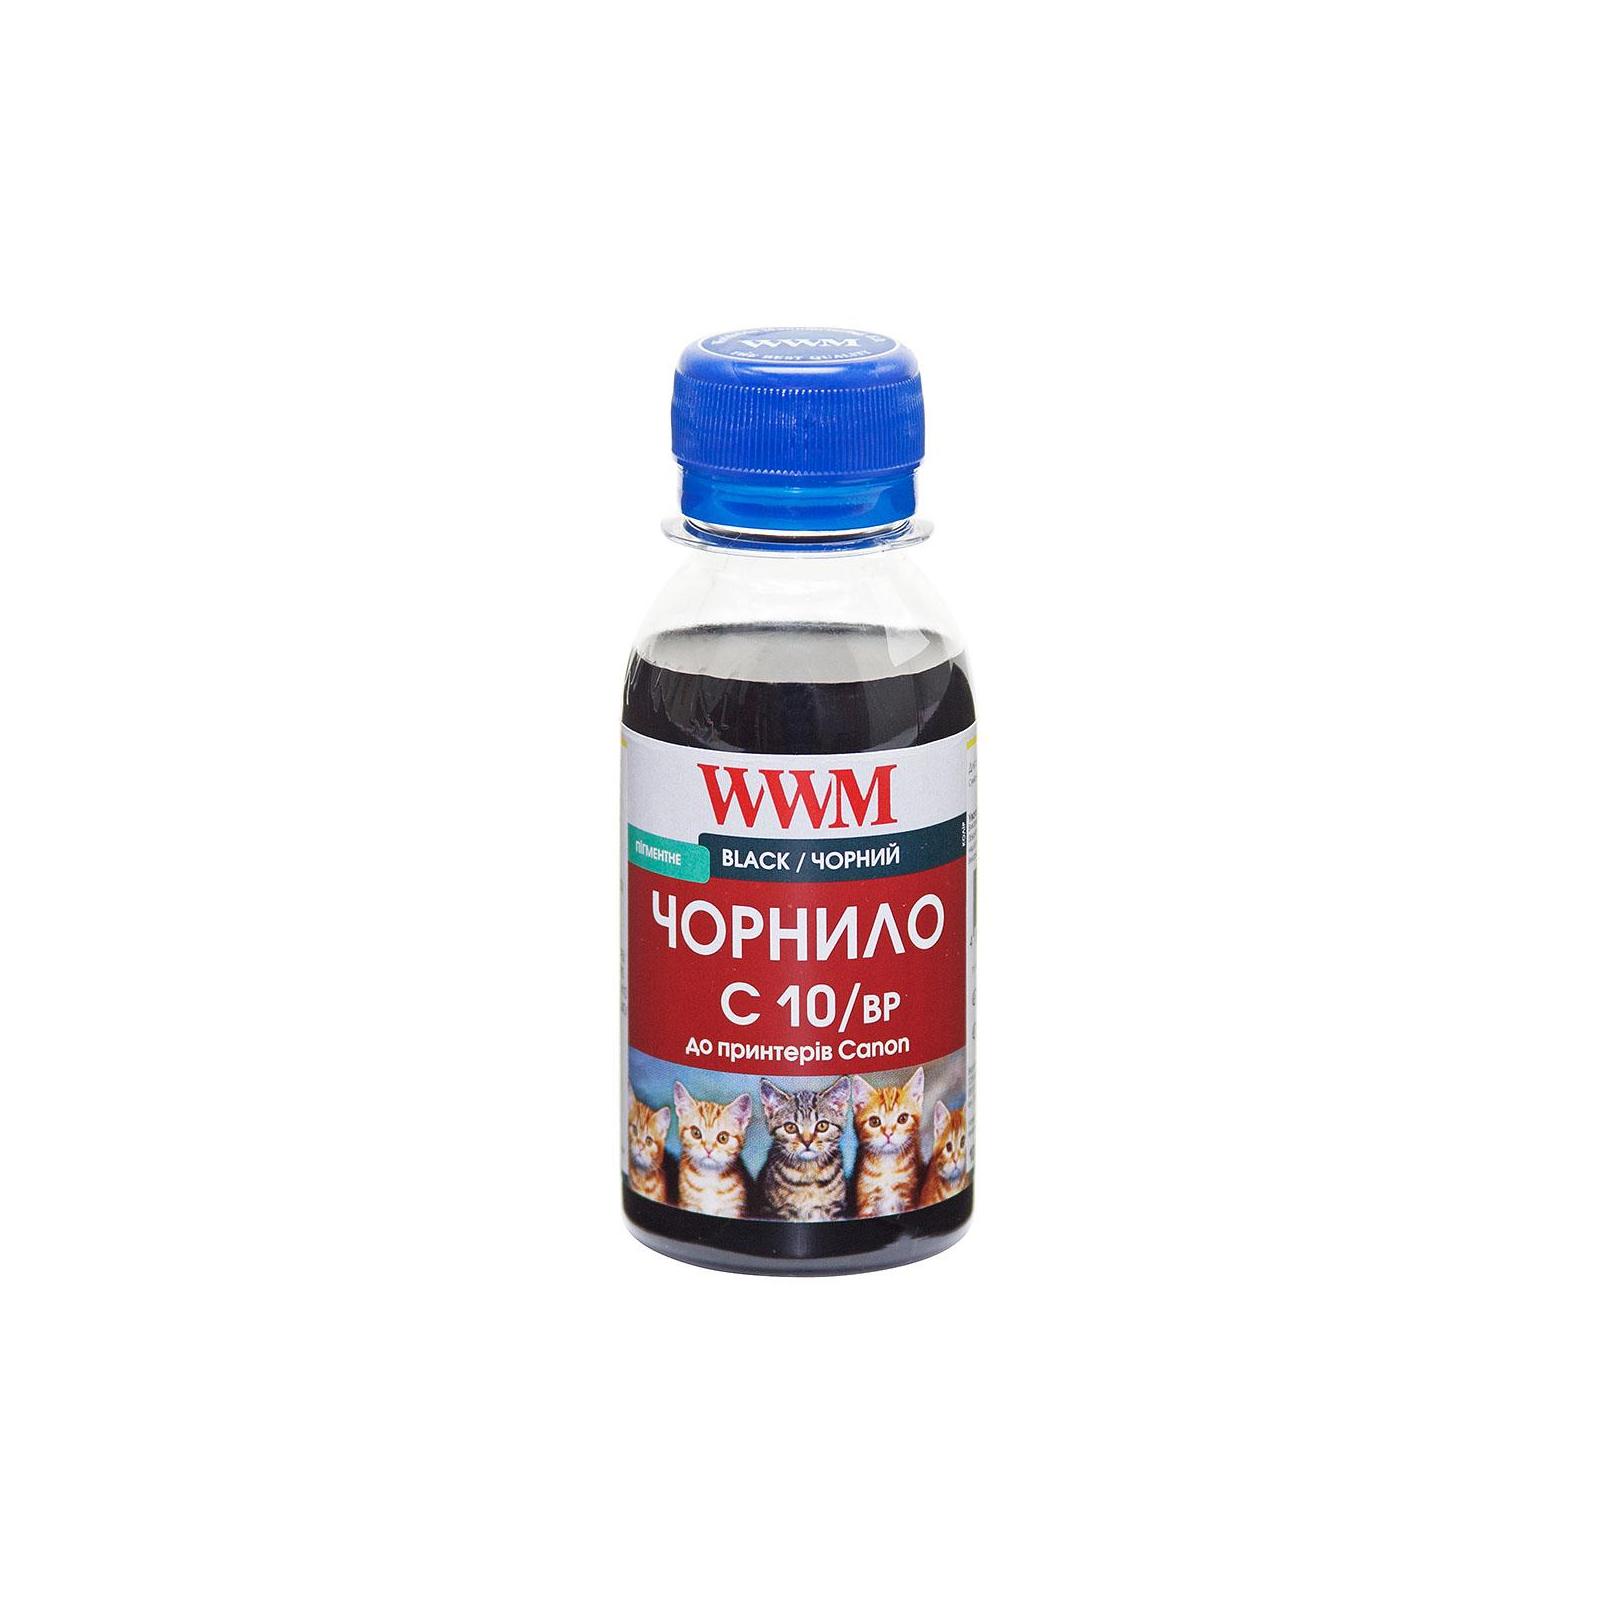 Чернила WWM CANON PG440/510/512/PGI520 BlackPigm 100мл (C10/BP-2)